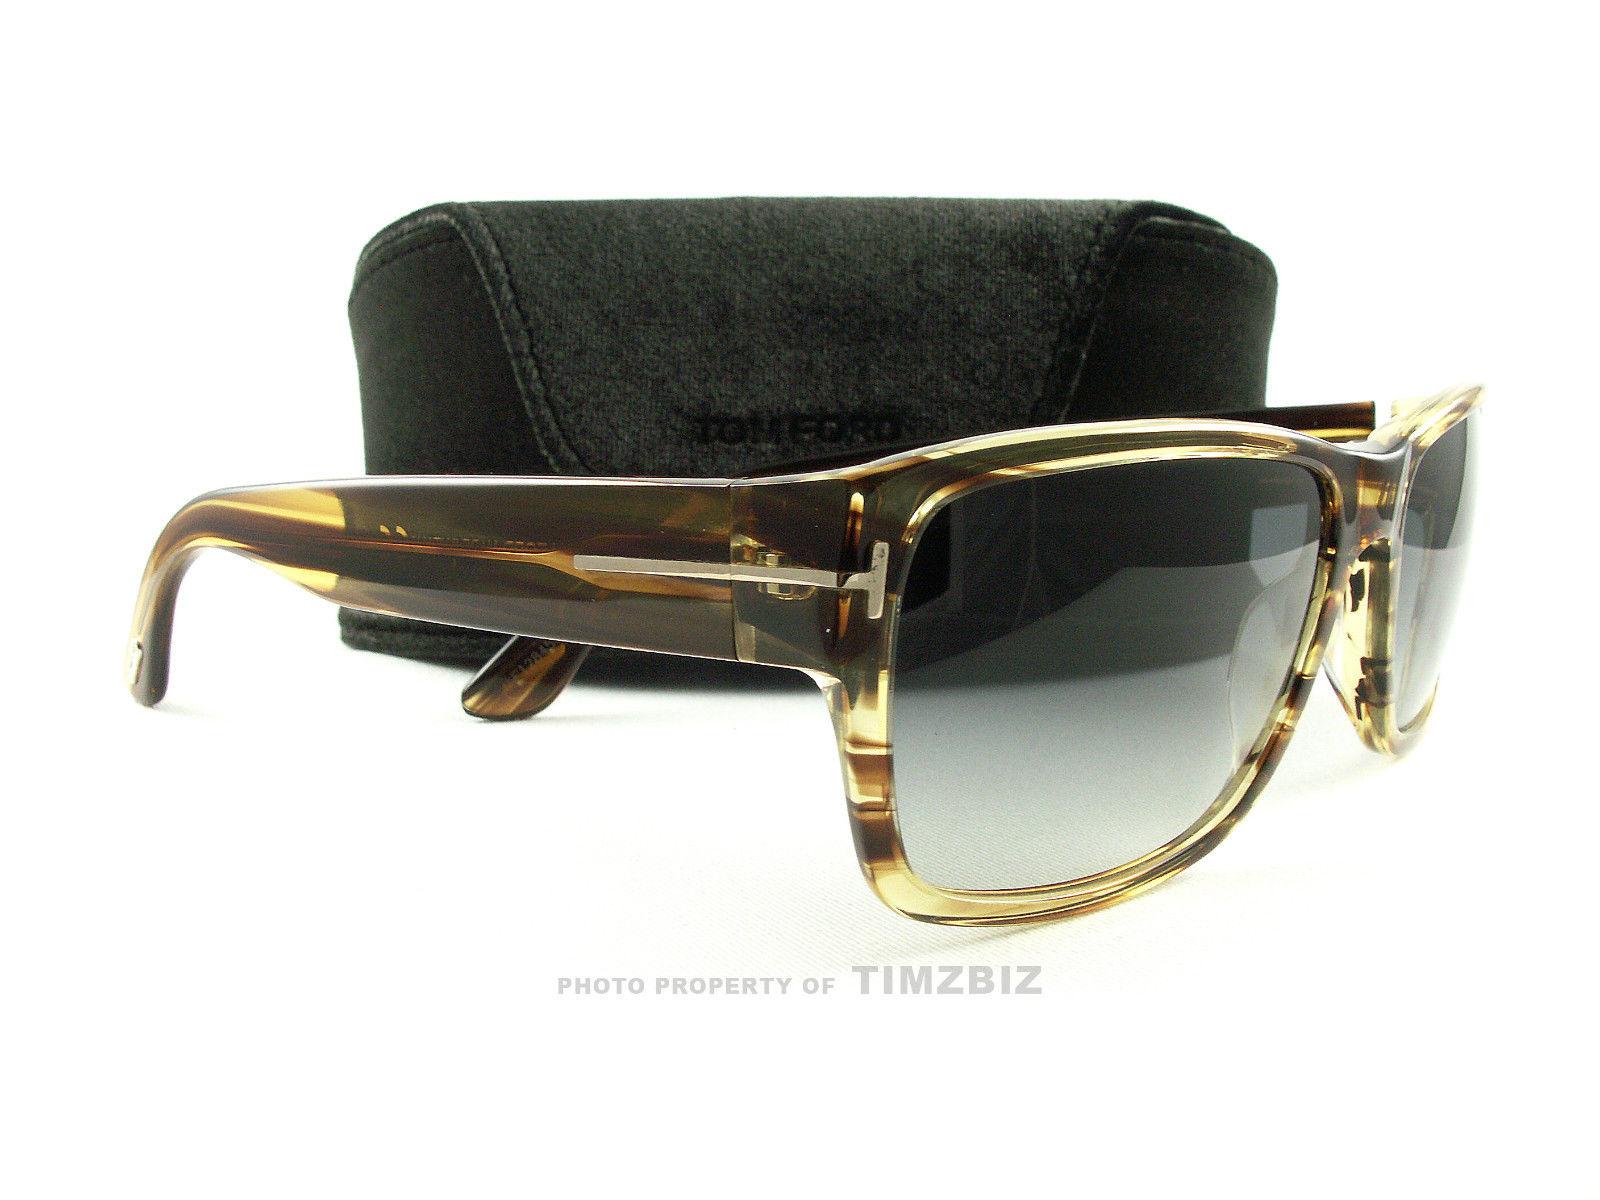 Tom Ford Sunglasses tf445 Mason 50B brown stripe ft0445 / s sunglasses for men and women